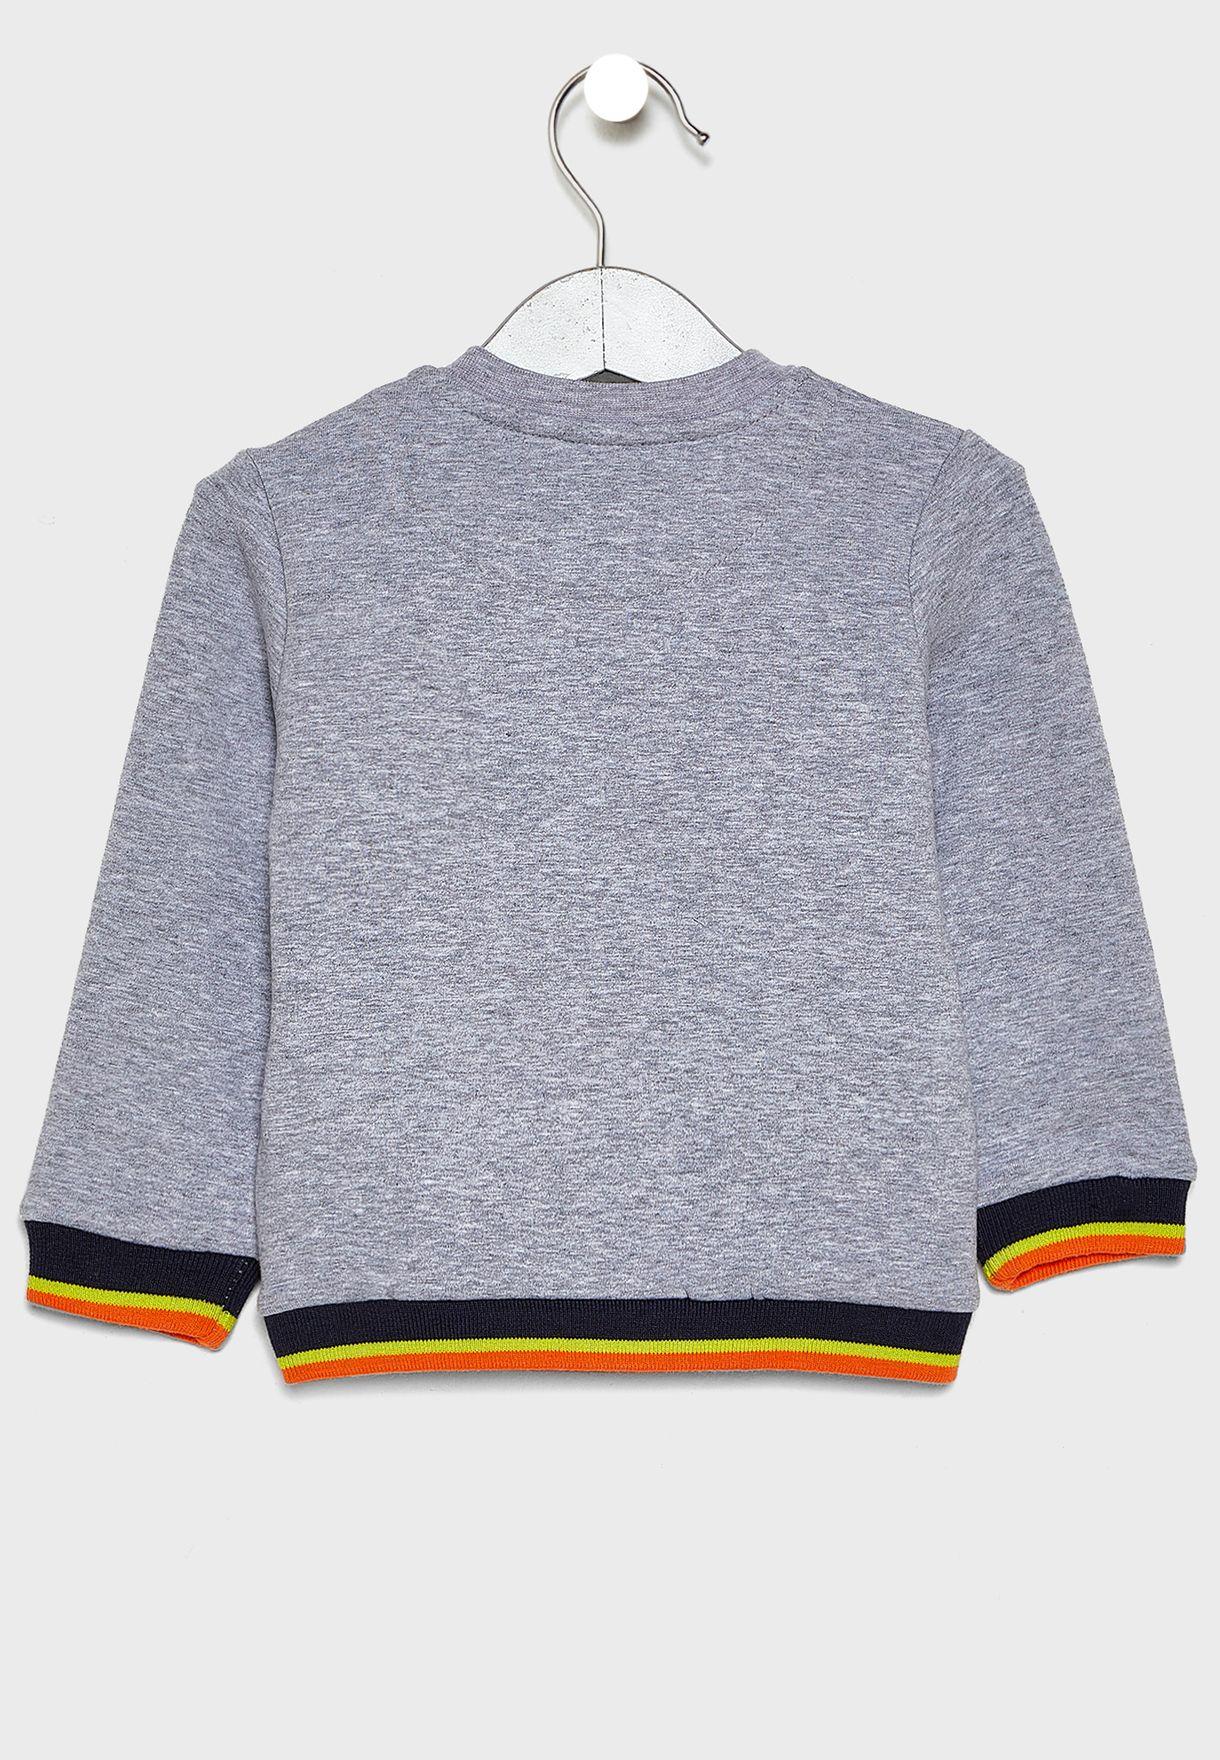 Kids Graphic Sweatshirt + Jogg Jeans Set